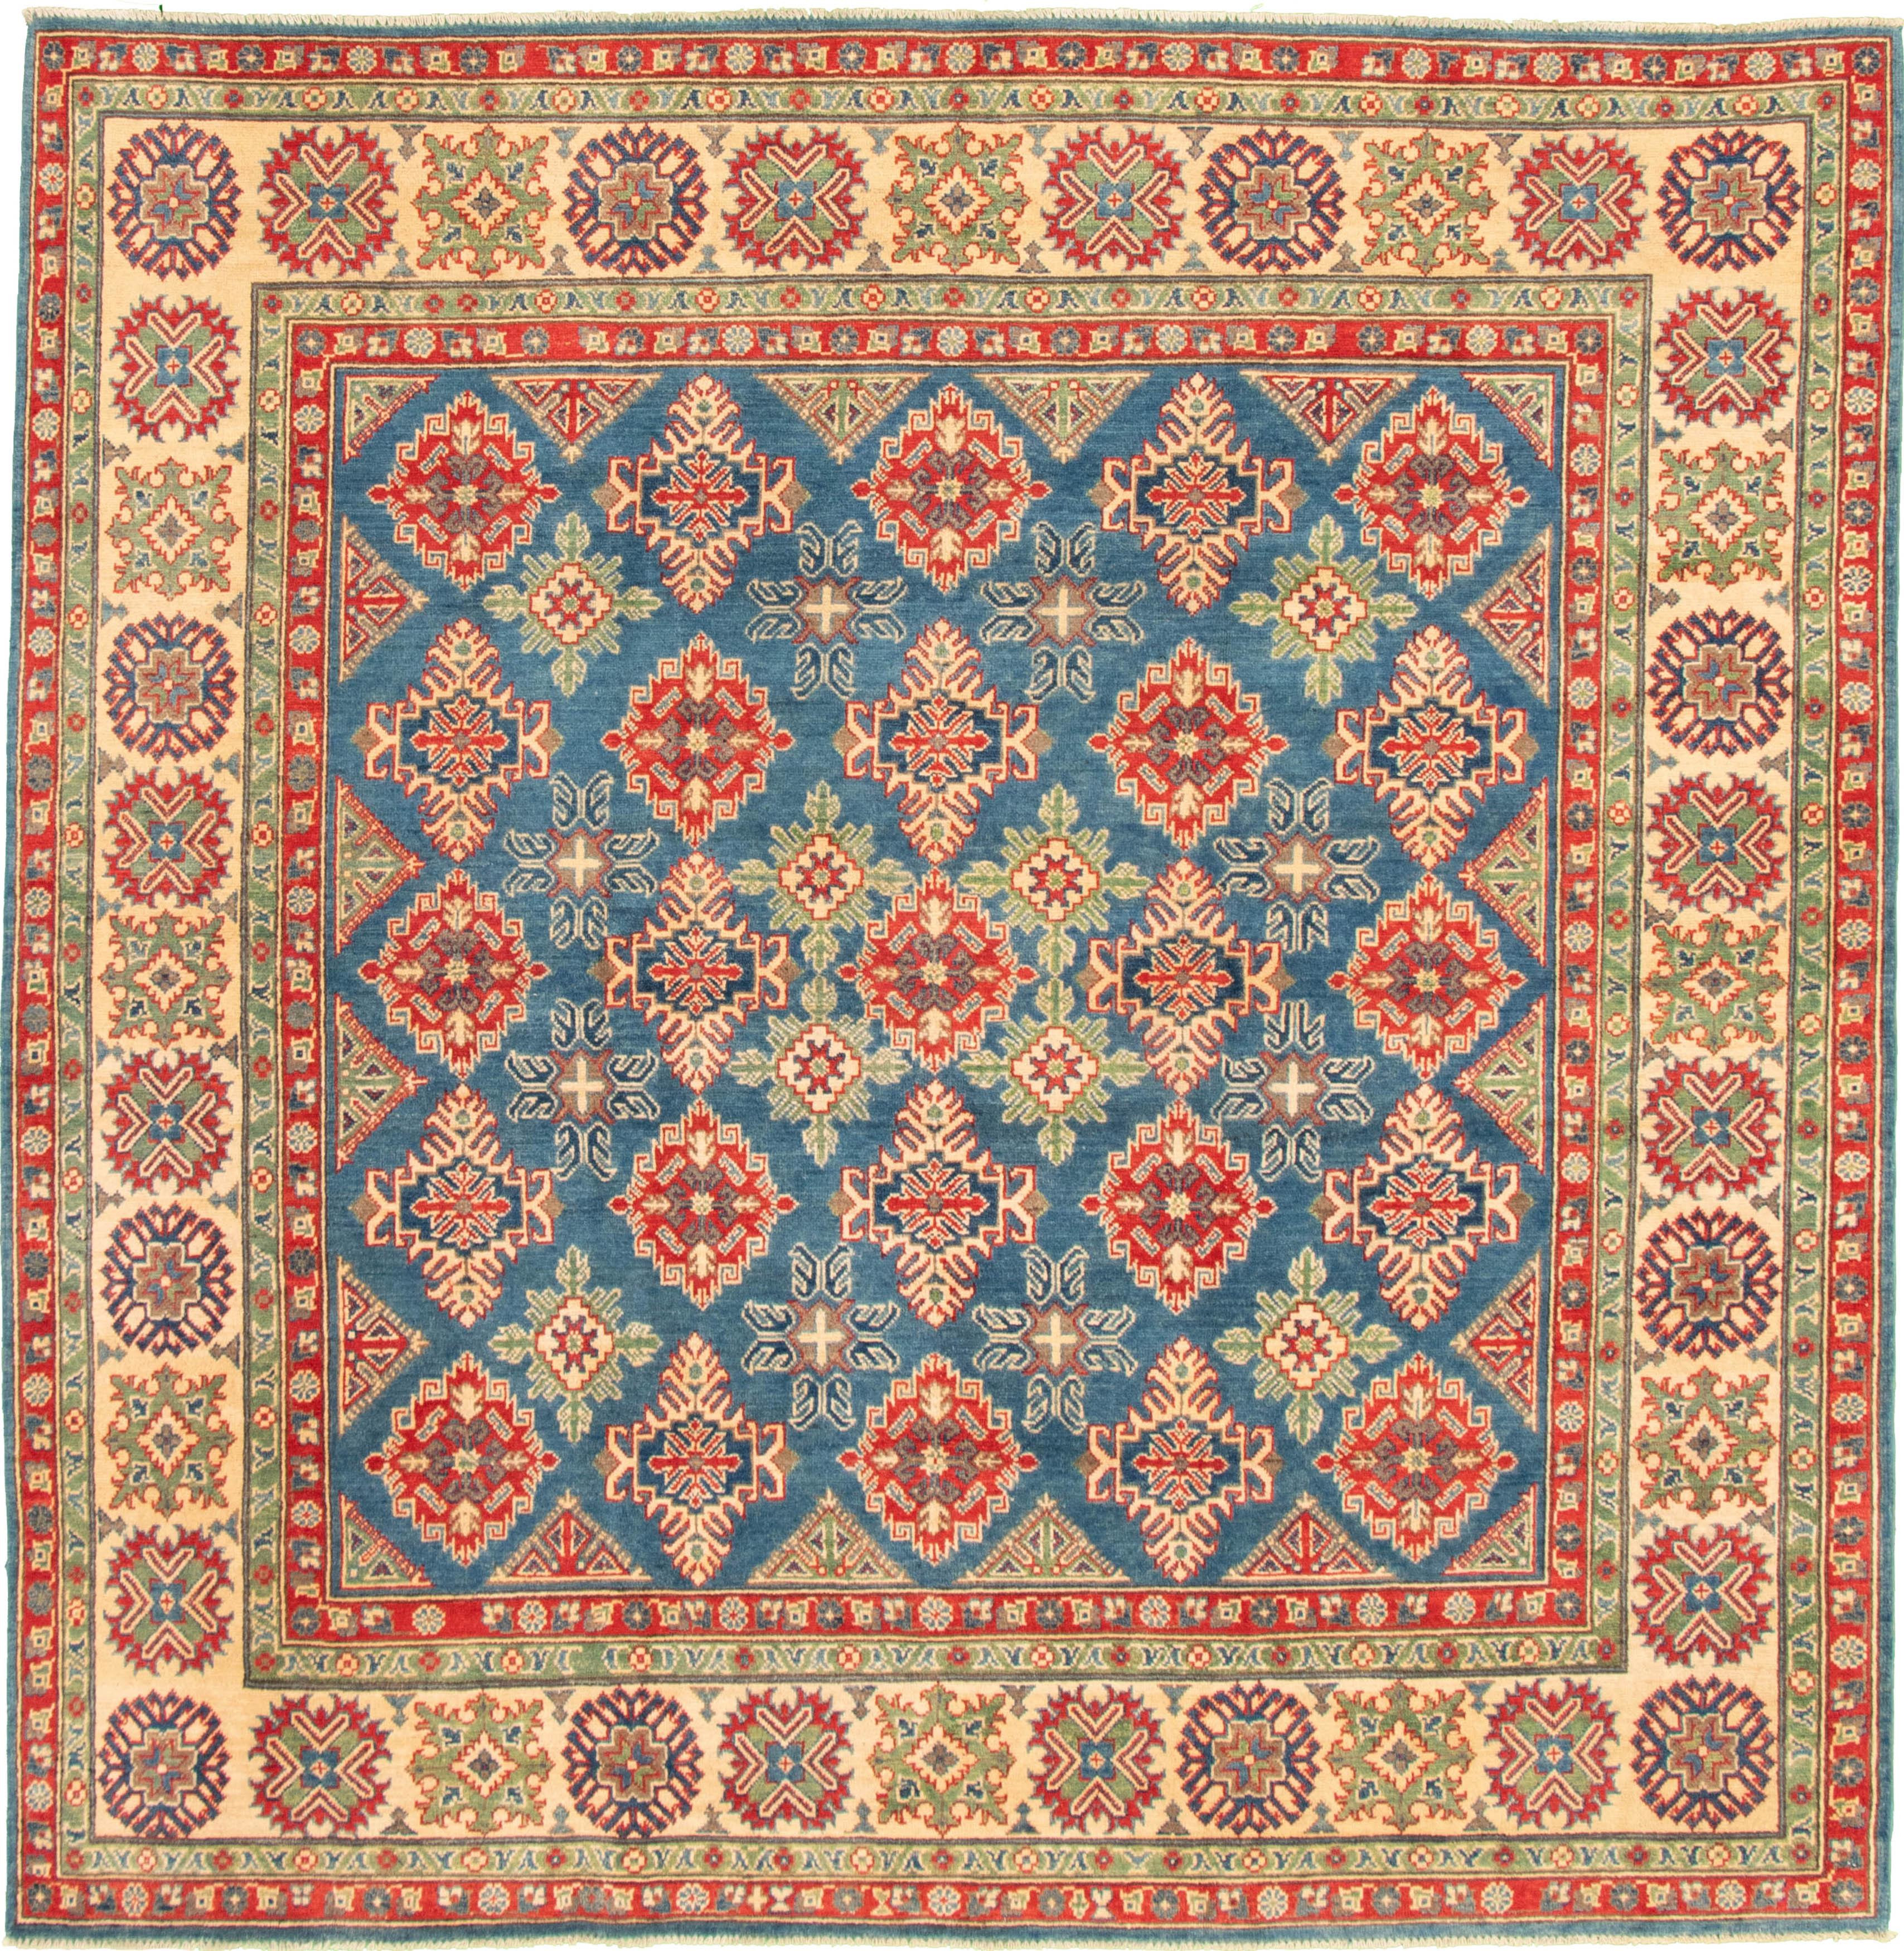 "Hand-knotted Finest Gazni Dark Blue Wool Rug 8'2"" x 8'2"" Size: 8'2"" x 8'2"""